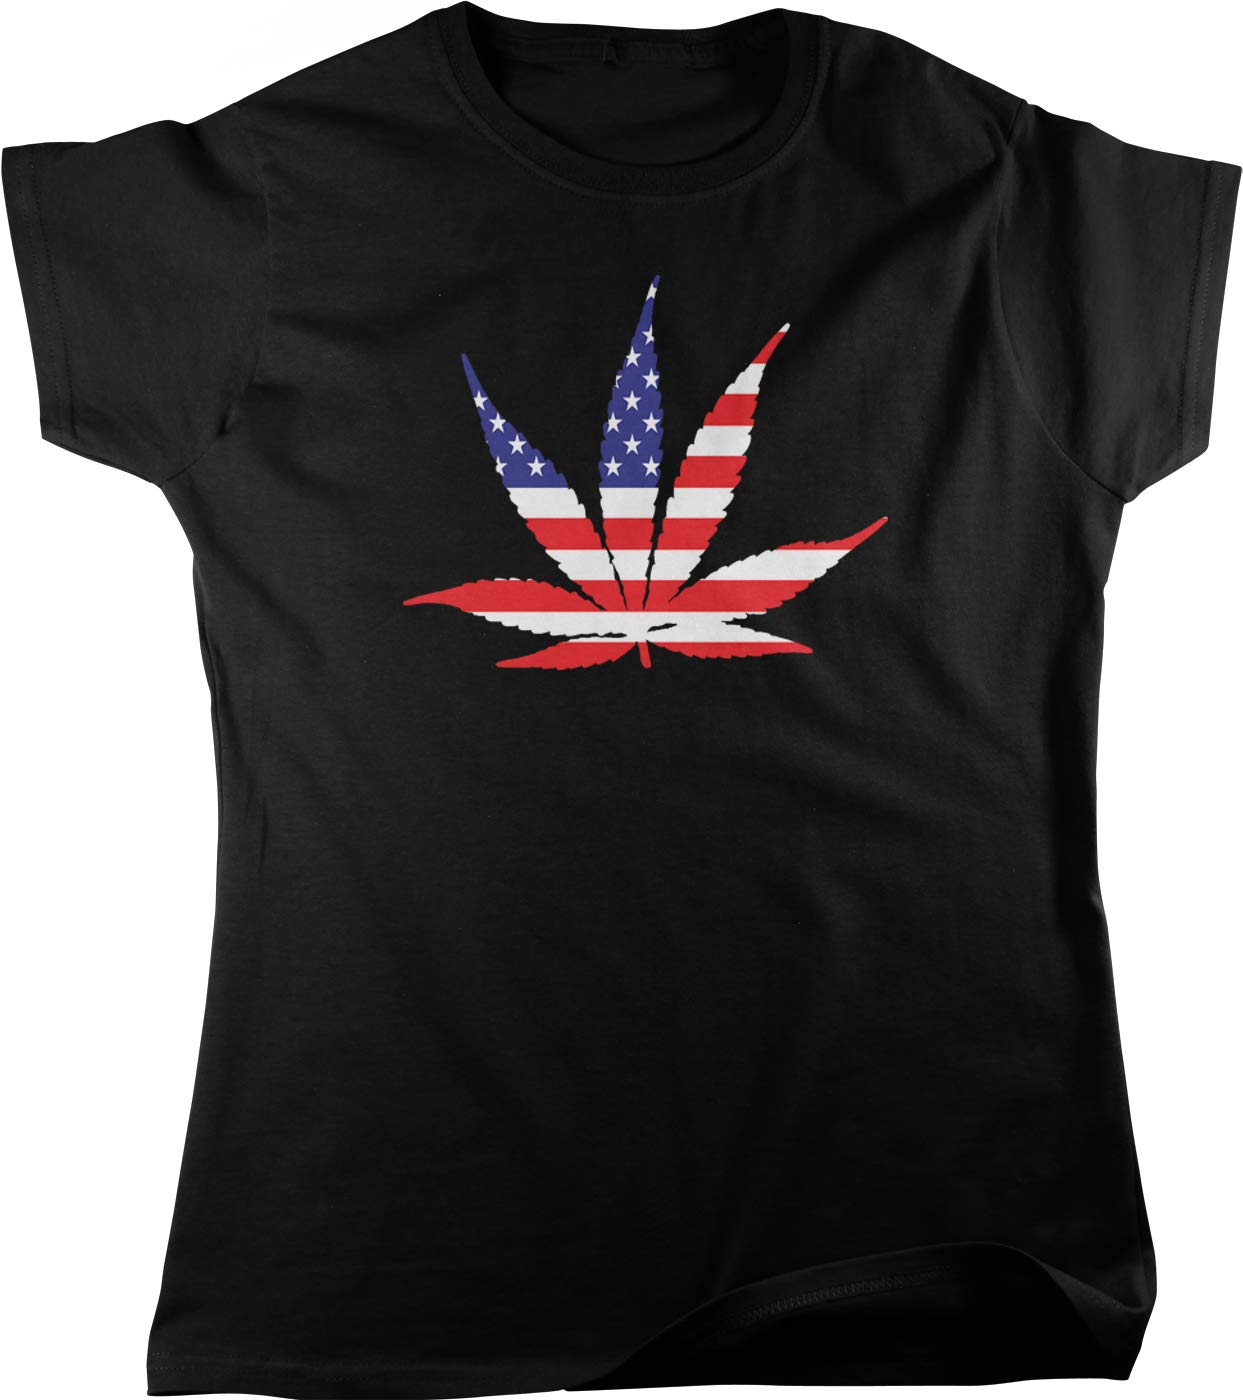 Hoodteez American Flag Pot Leaf, USA Weed, Marijuana Women's T-Shirt